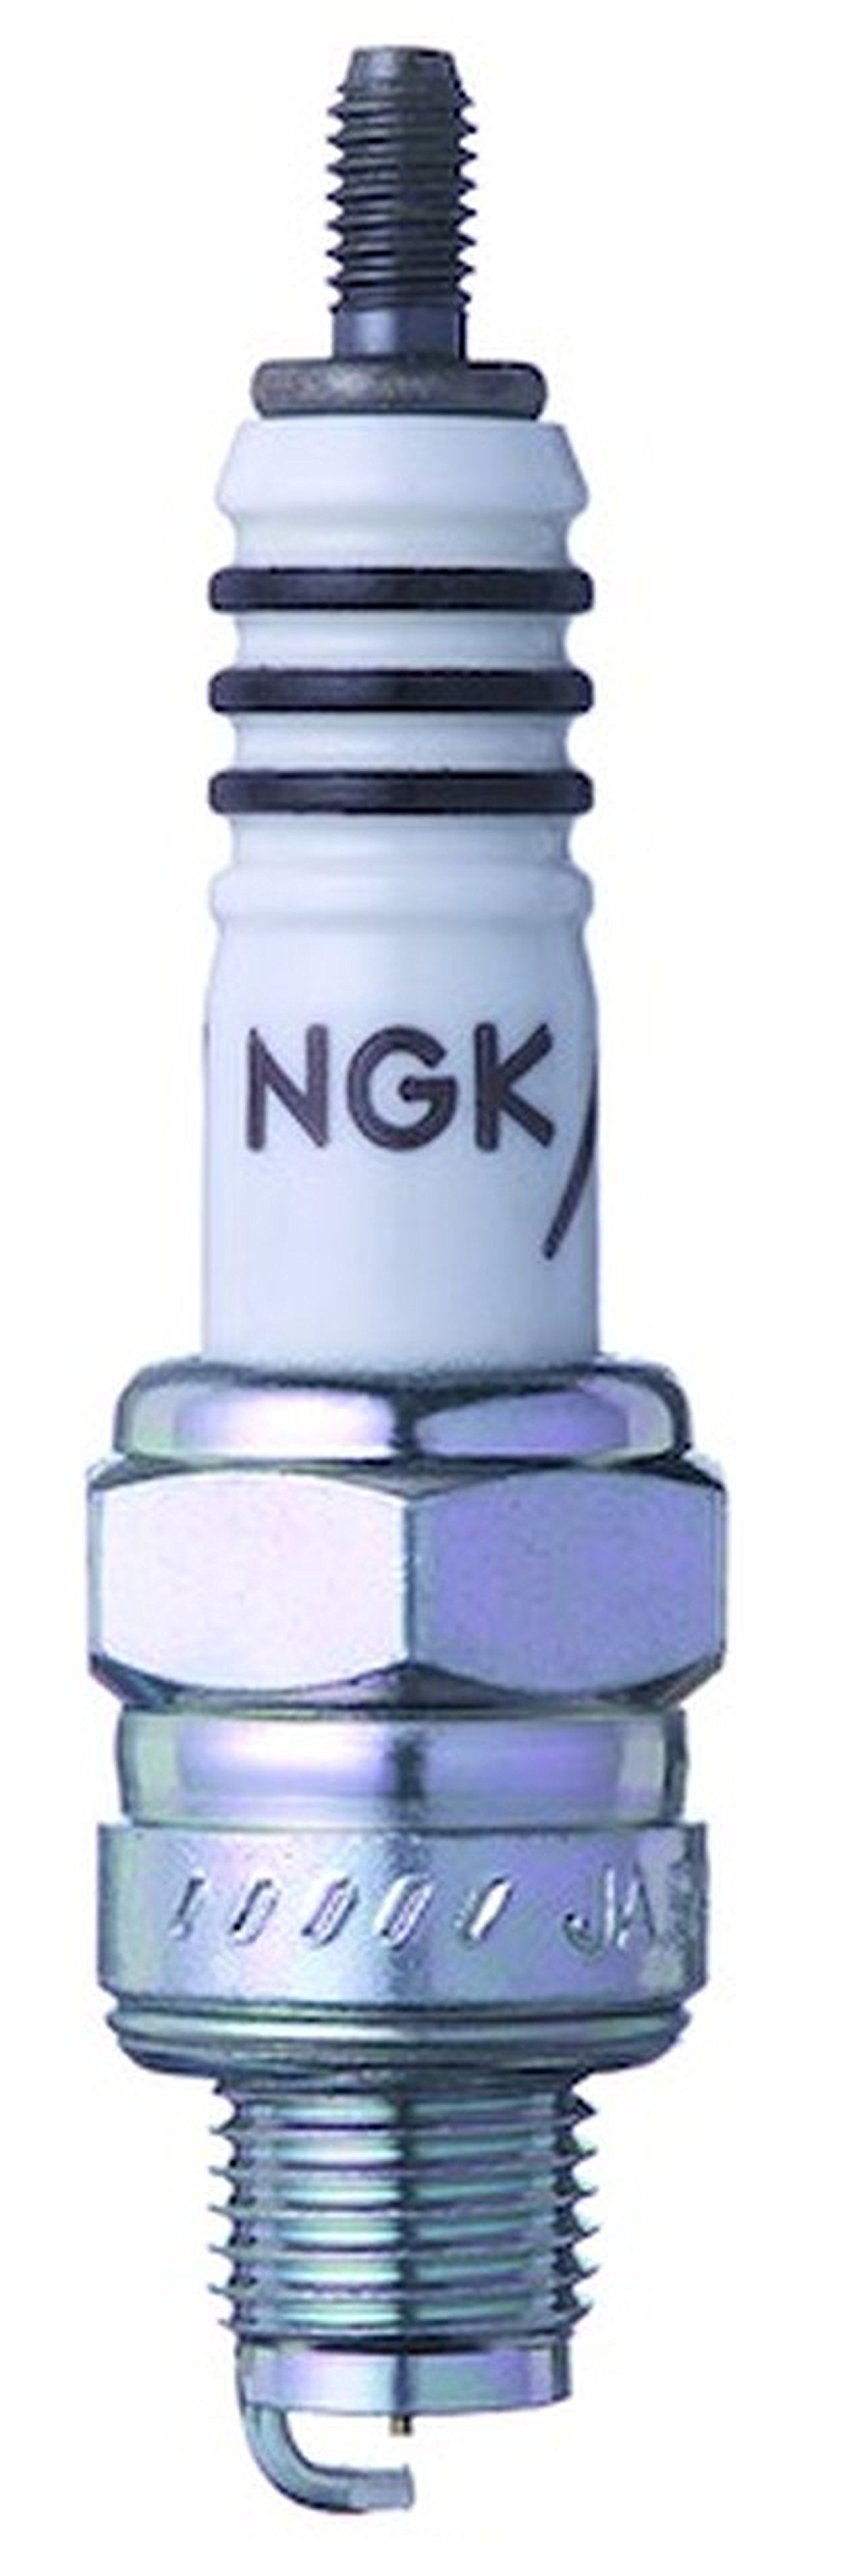 4 New NGK Iridium IX Spark Plugs CR7HIX # 7544 product image